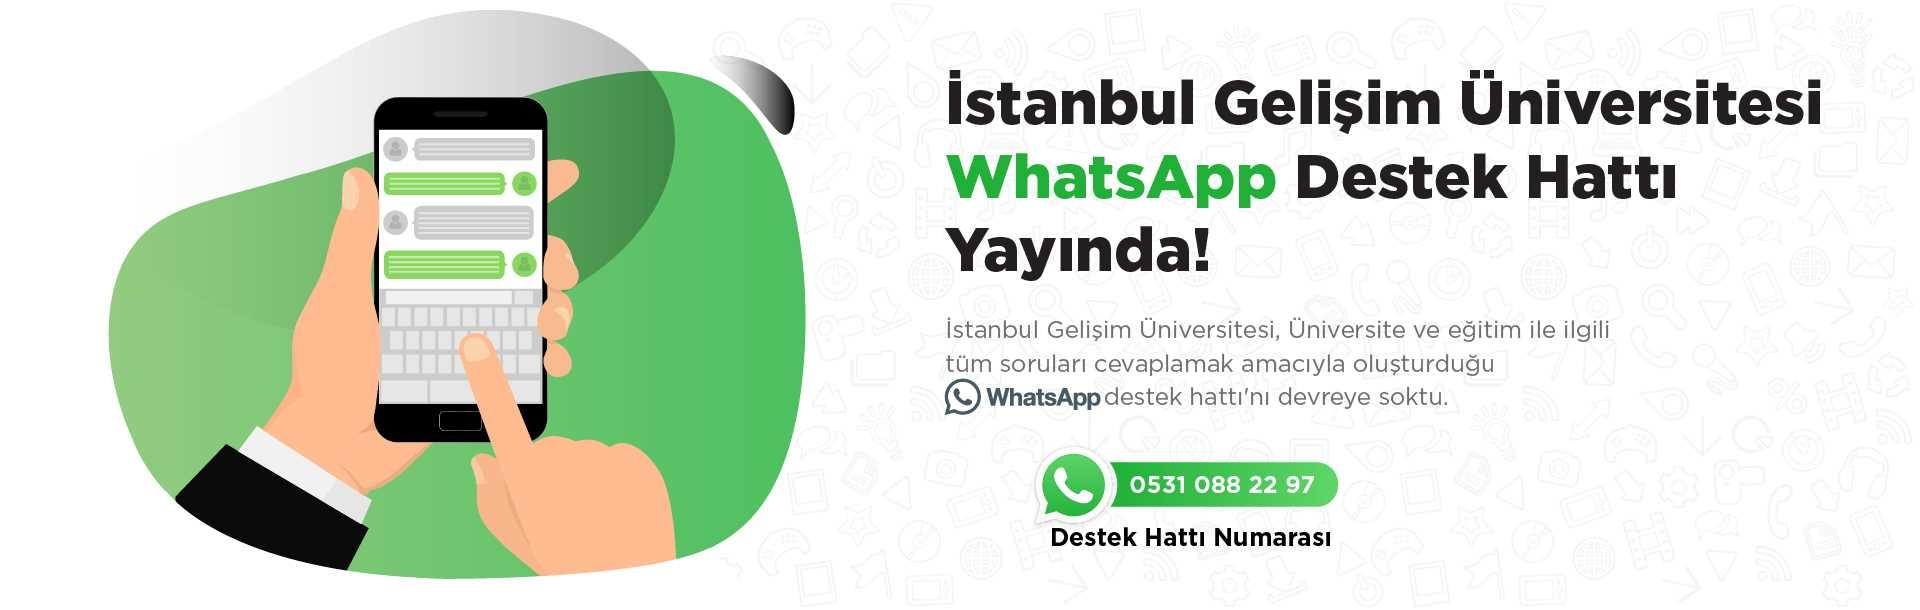 Whatsapp Hattı